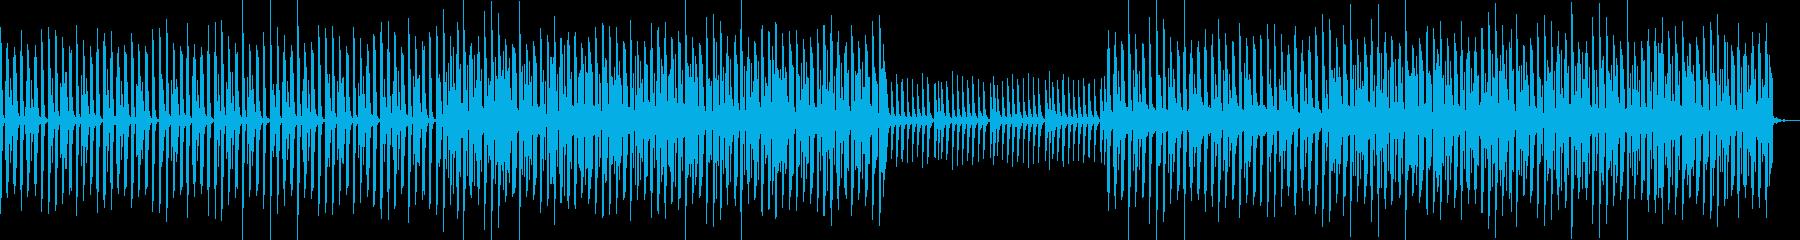 YouTube・エンディング・EDMの再生済みの波形